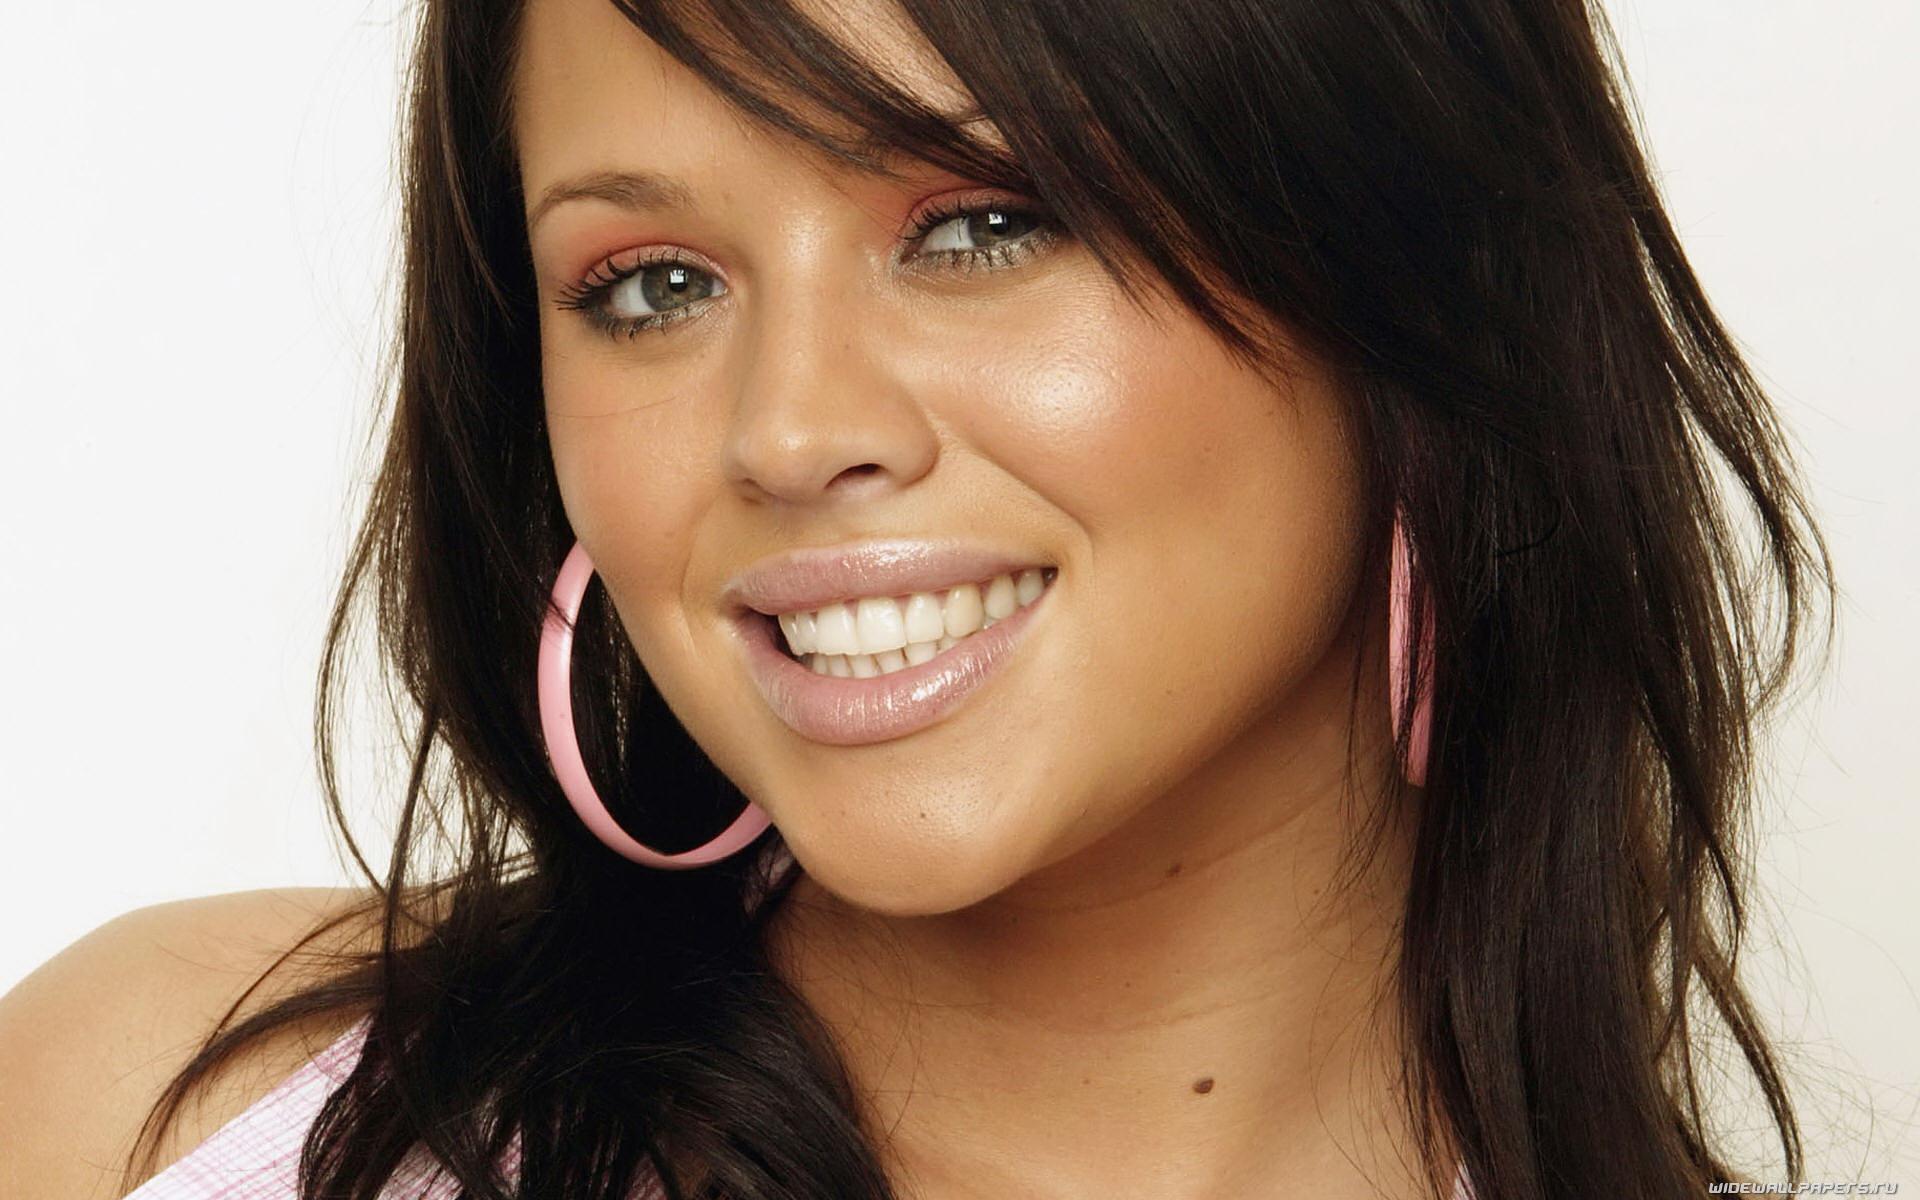 face girl smiling hottie -#main